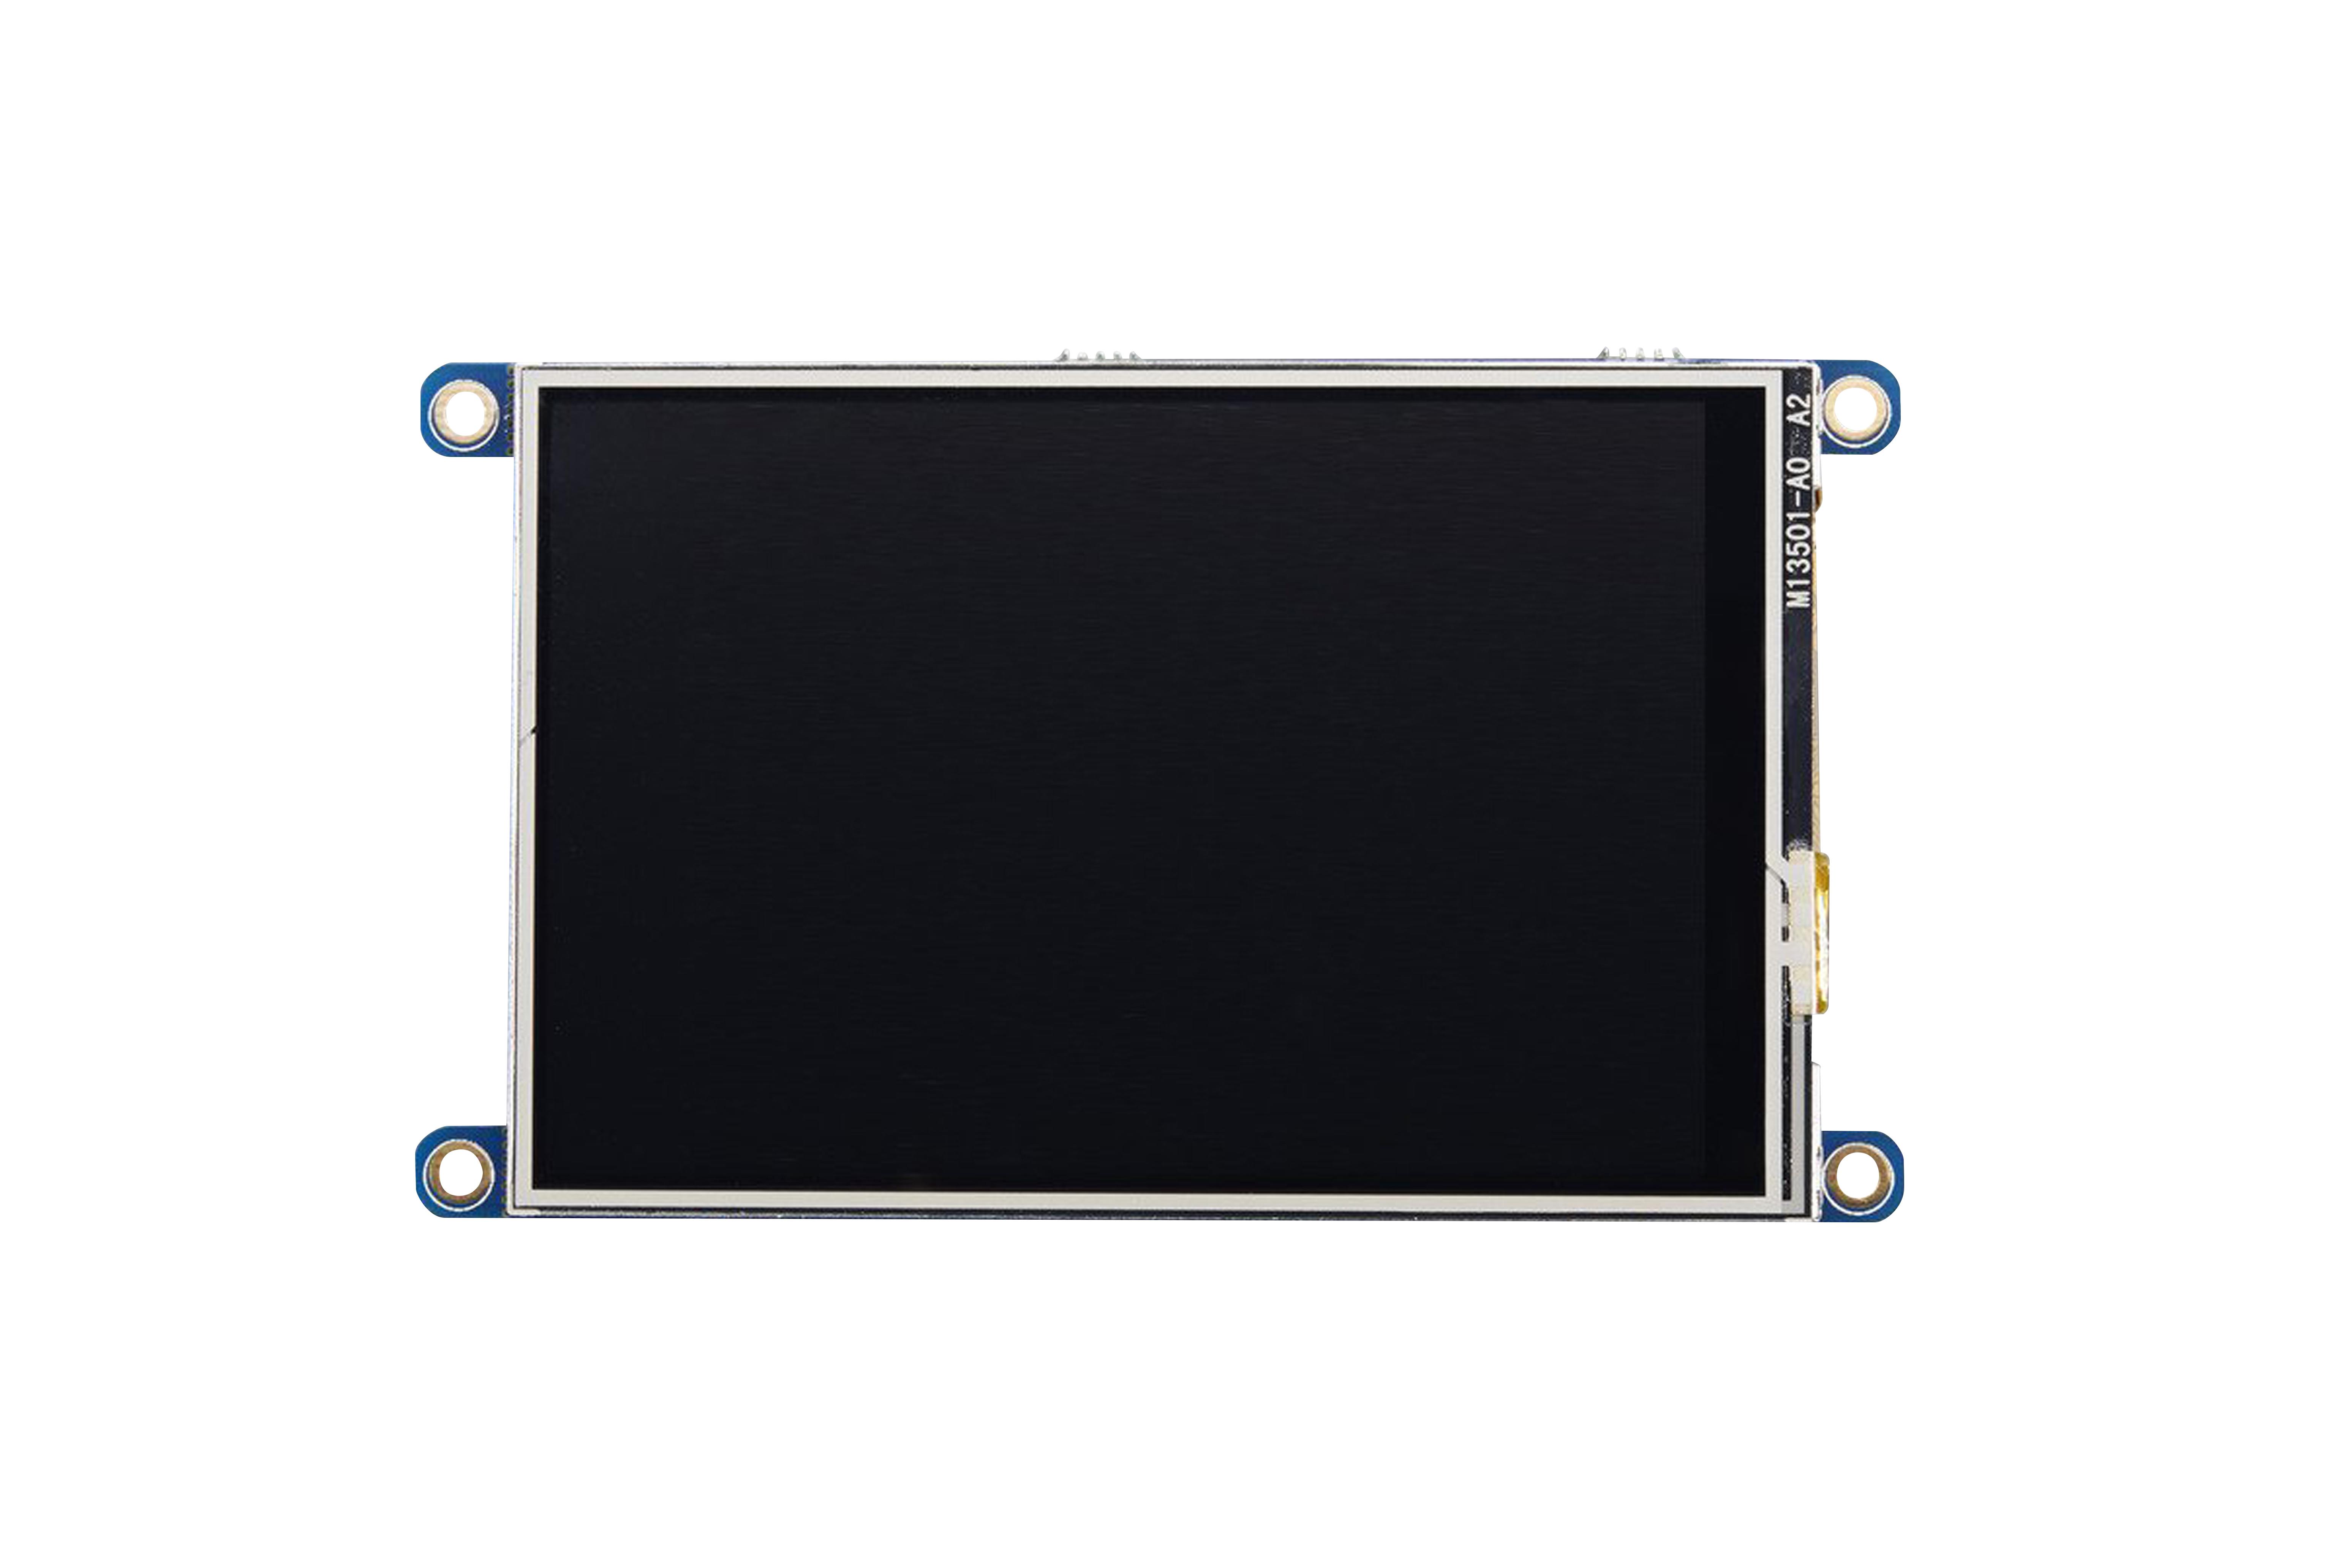 "Adafruit PiTFT Plus 480x320 3.5"" TFT+Touchscreen for Raspberry Pi"